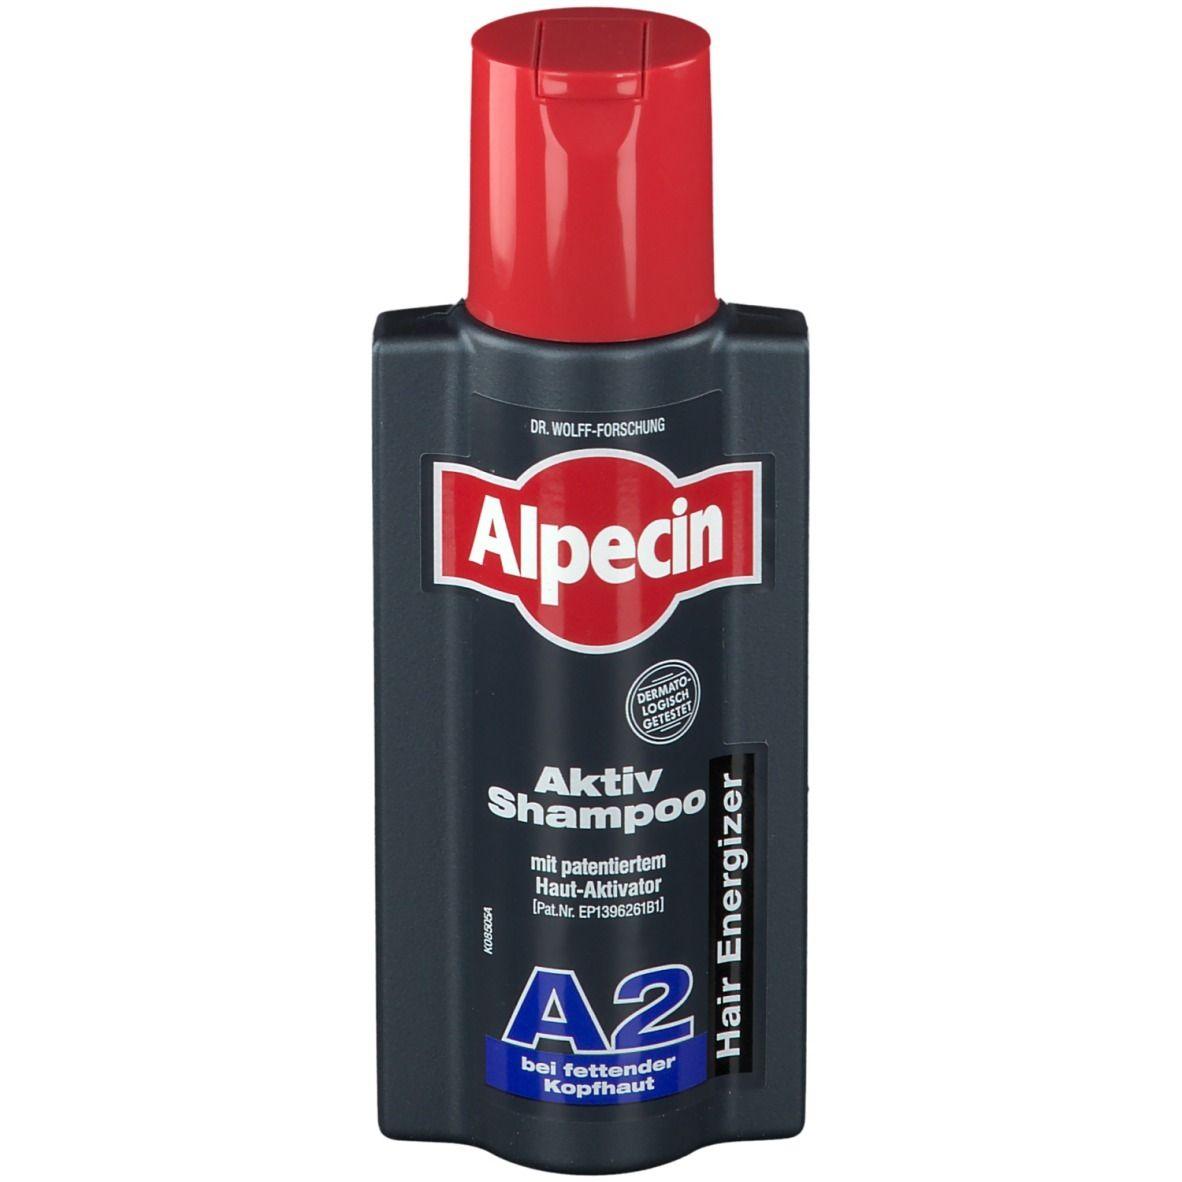 Alpecin Aktiv-Shampoo A2